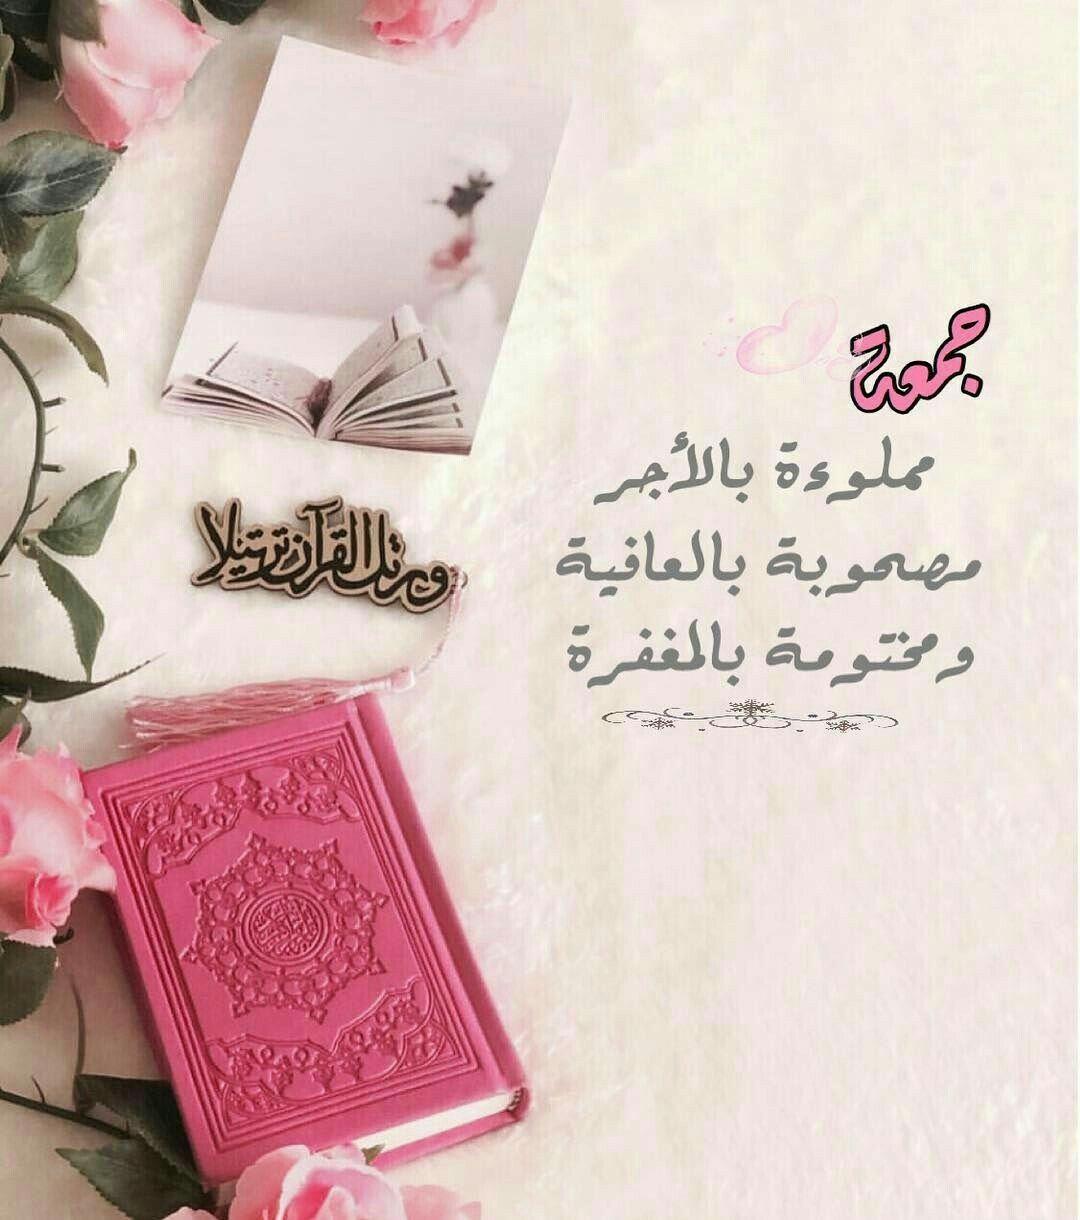 Pin By صورة و كلمة On جمعة مباركة Arabic Love Quotes Blessed Friday Arabic Quotes